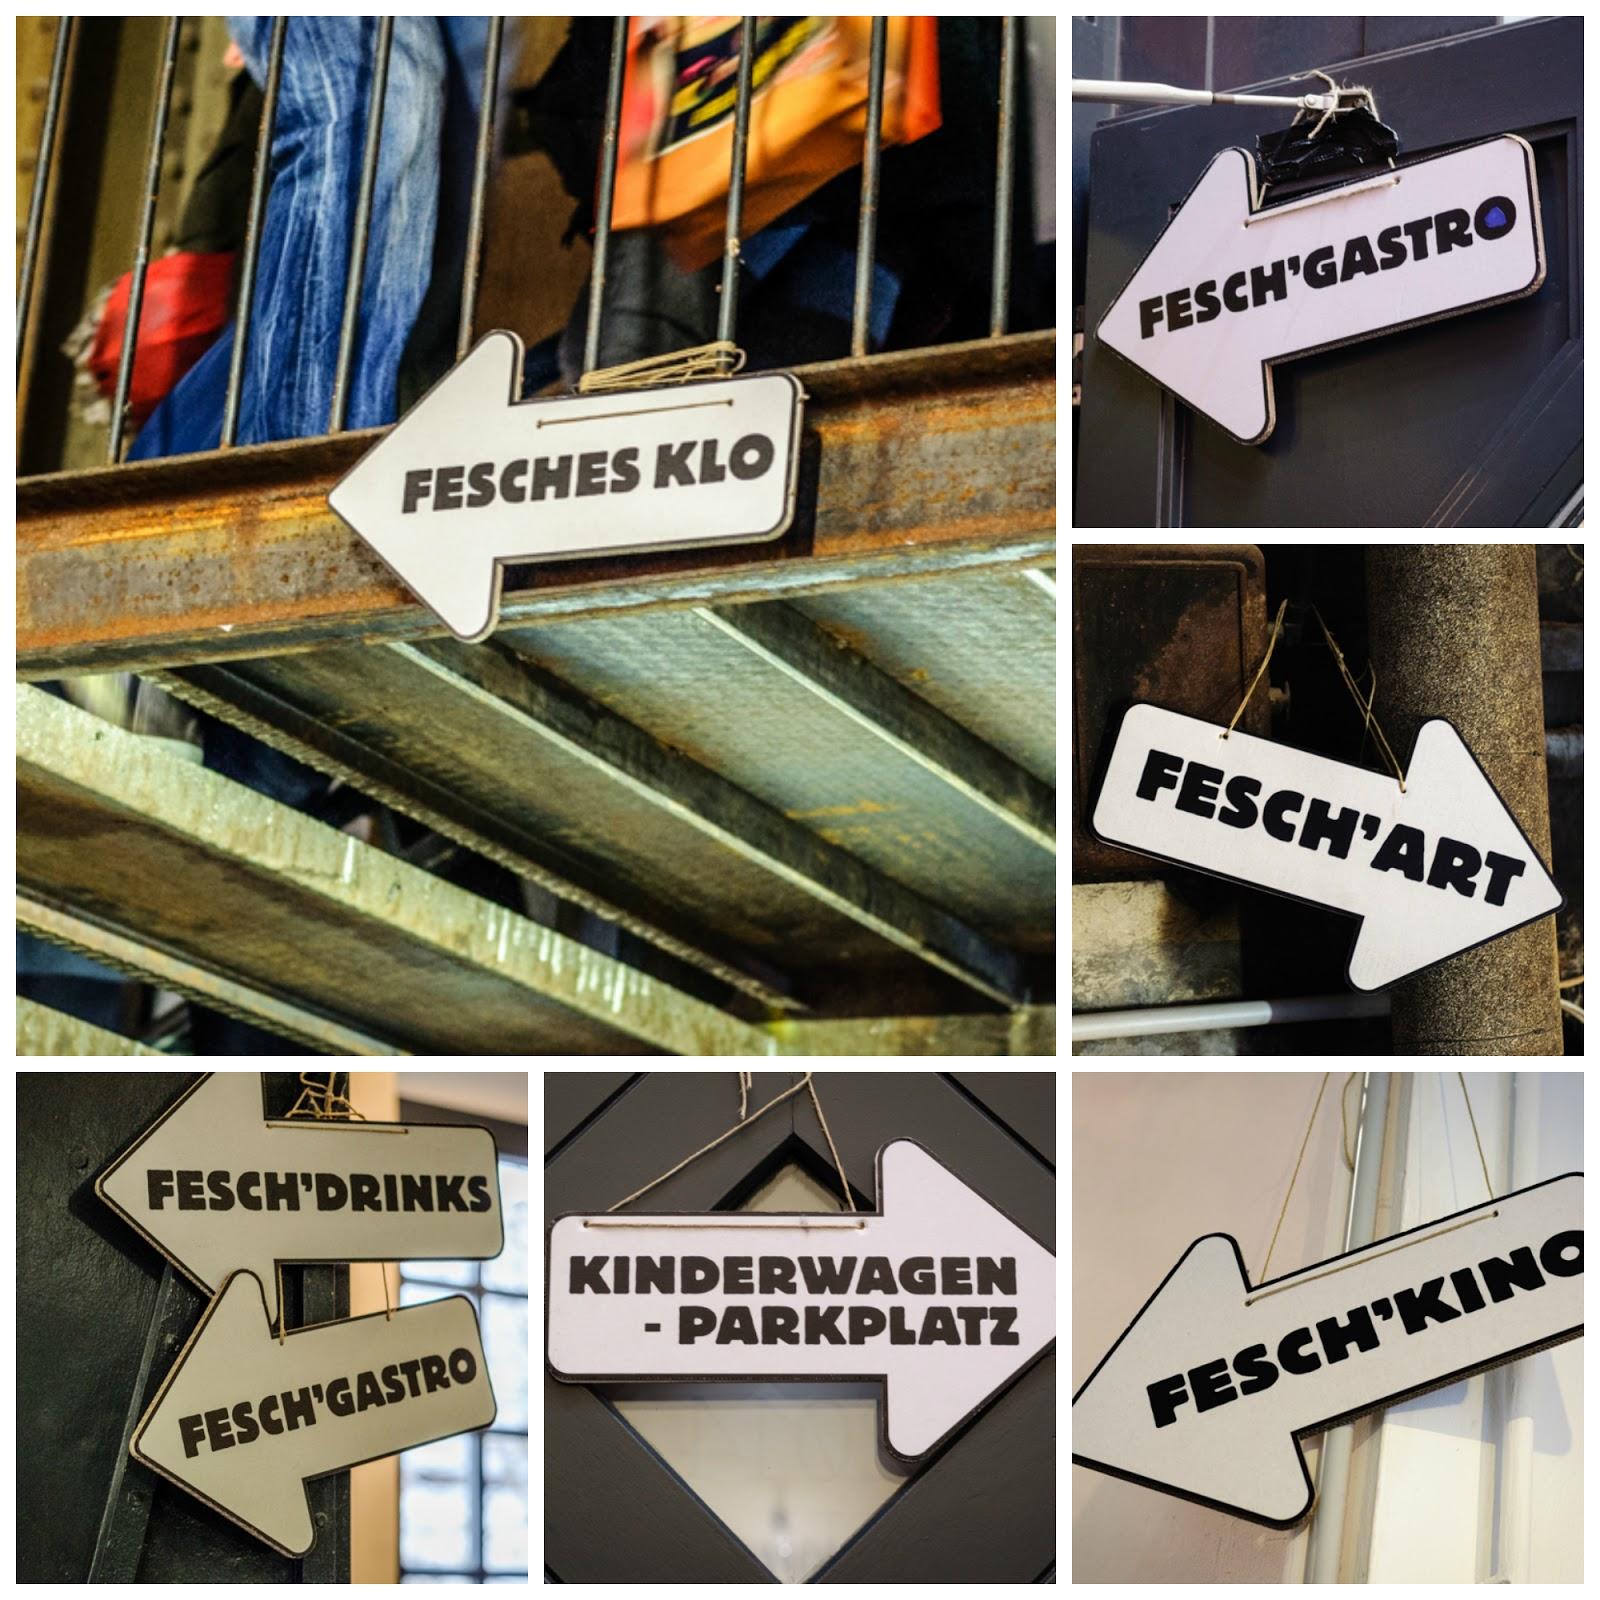 Feschmarkt-Designmarkt | Ottakringer Brauerei  - pigugi.blogspot.com